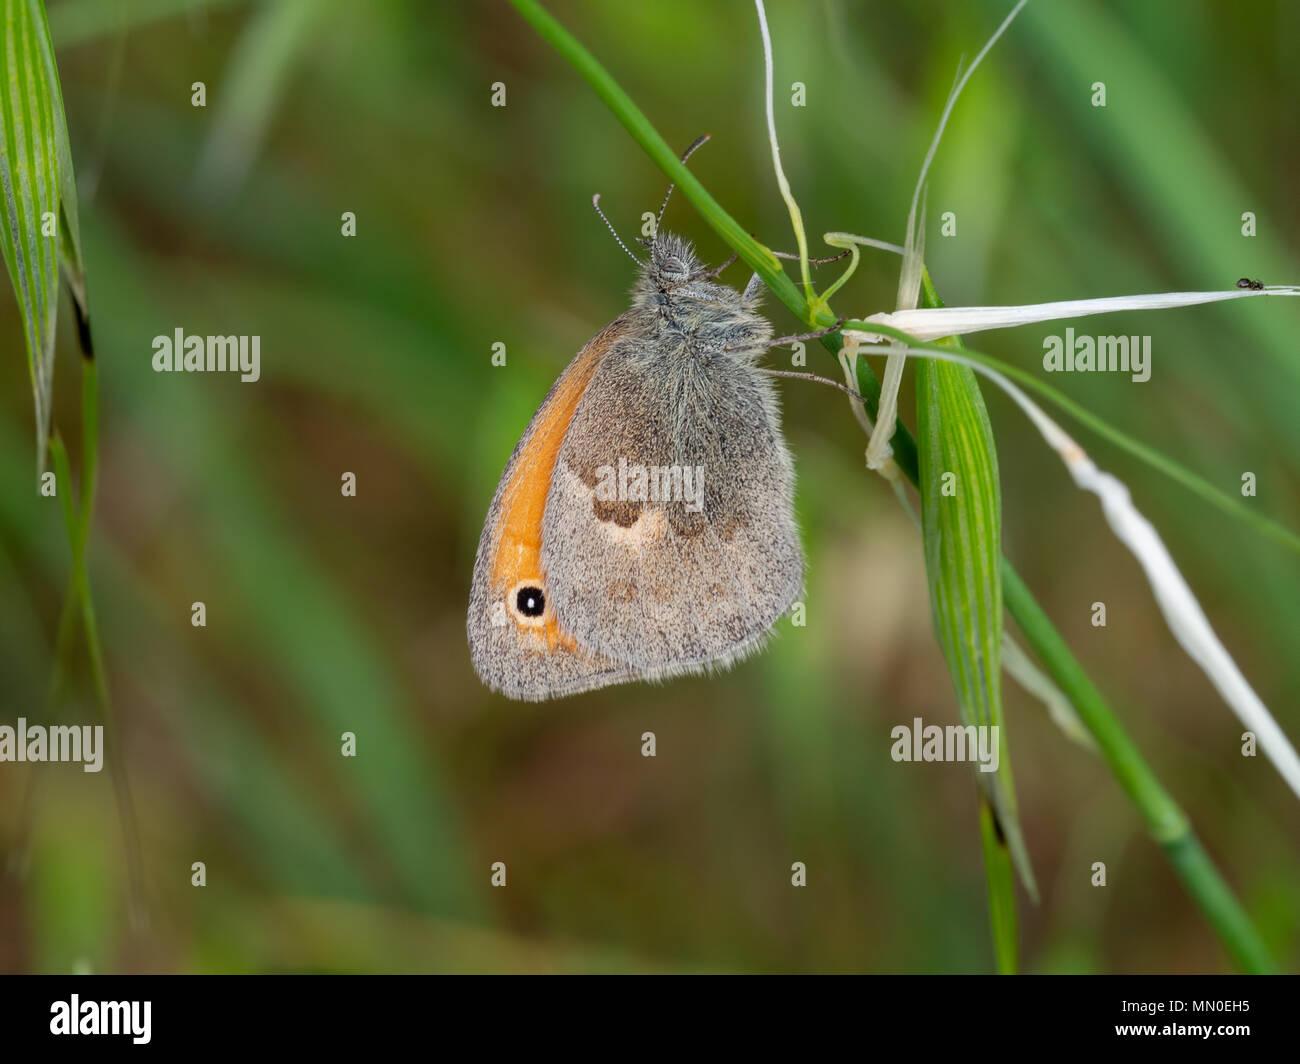 The small heath (Coenonympha pamphilus) - Stock Image